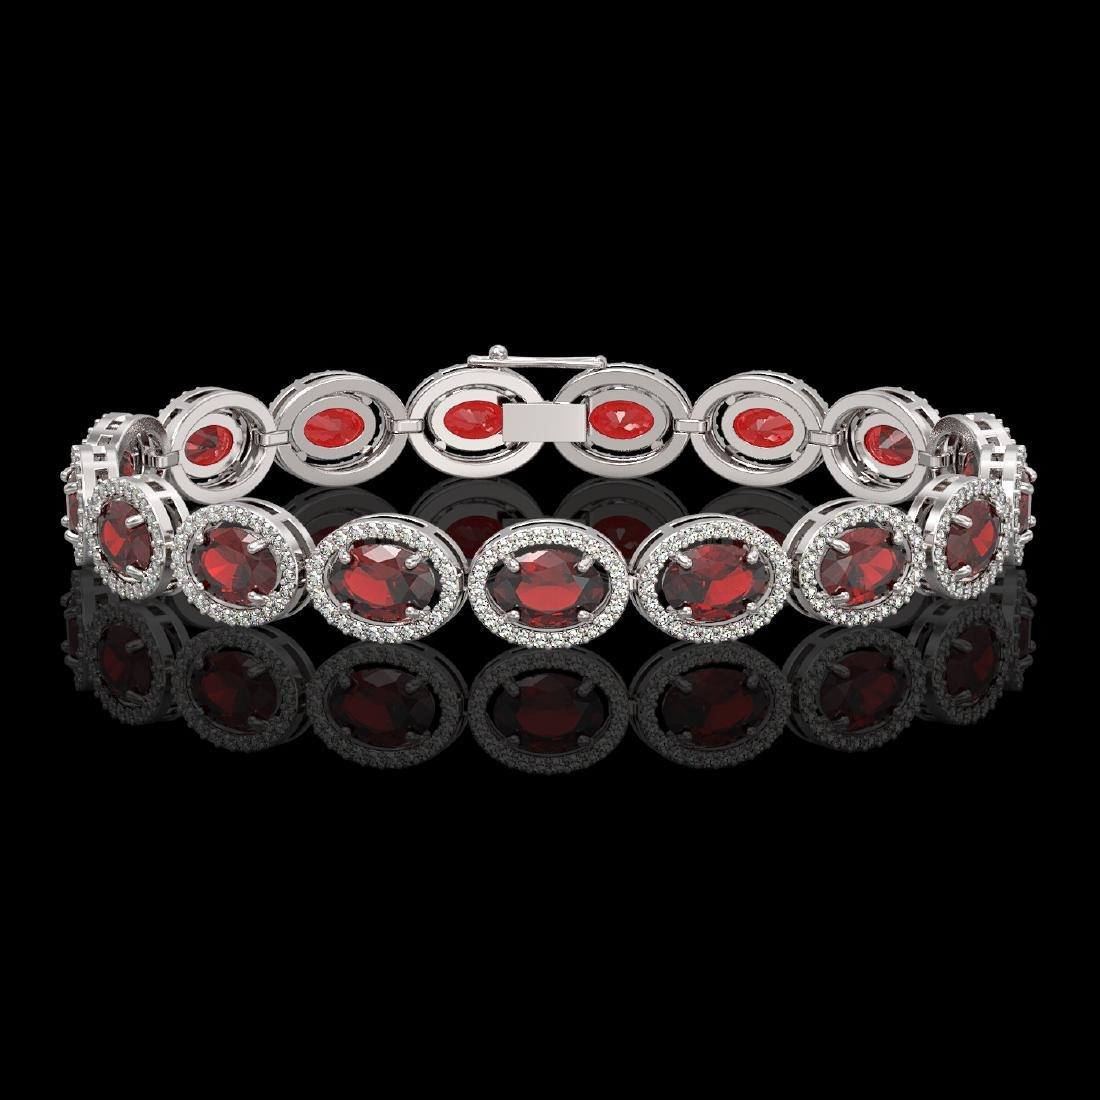 21.98 CTW Garnet & Diamond Halo Bracelet 10K White Gold